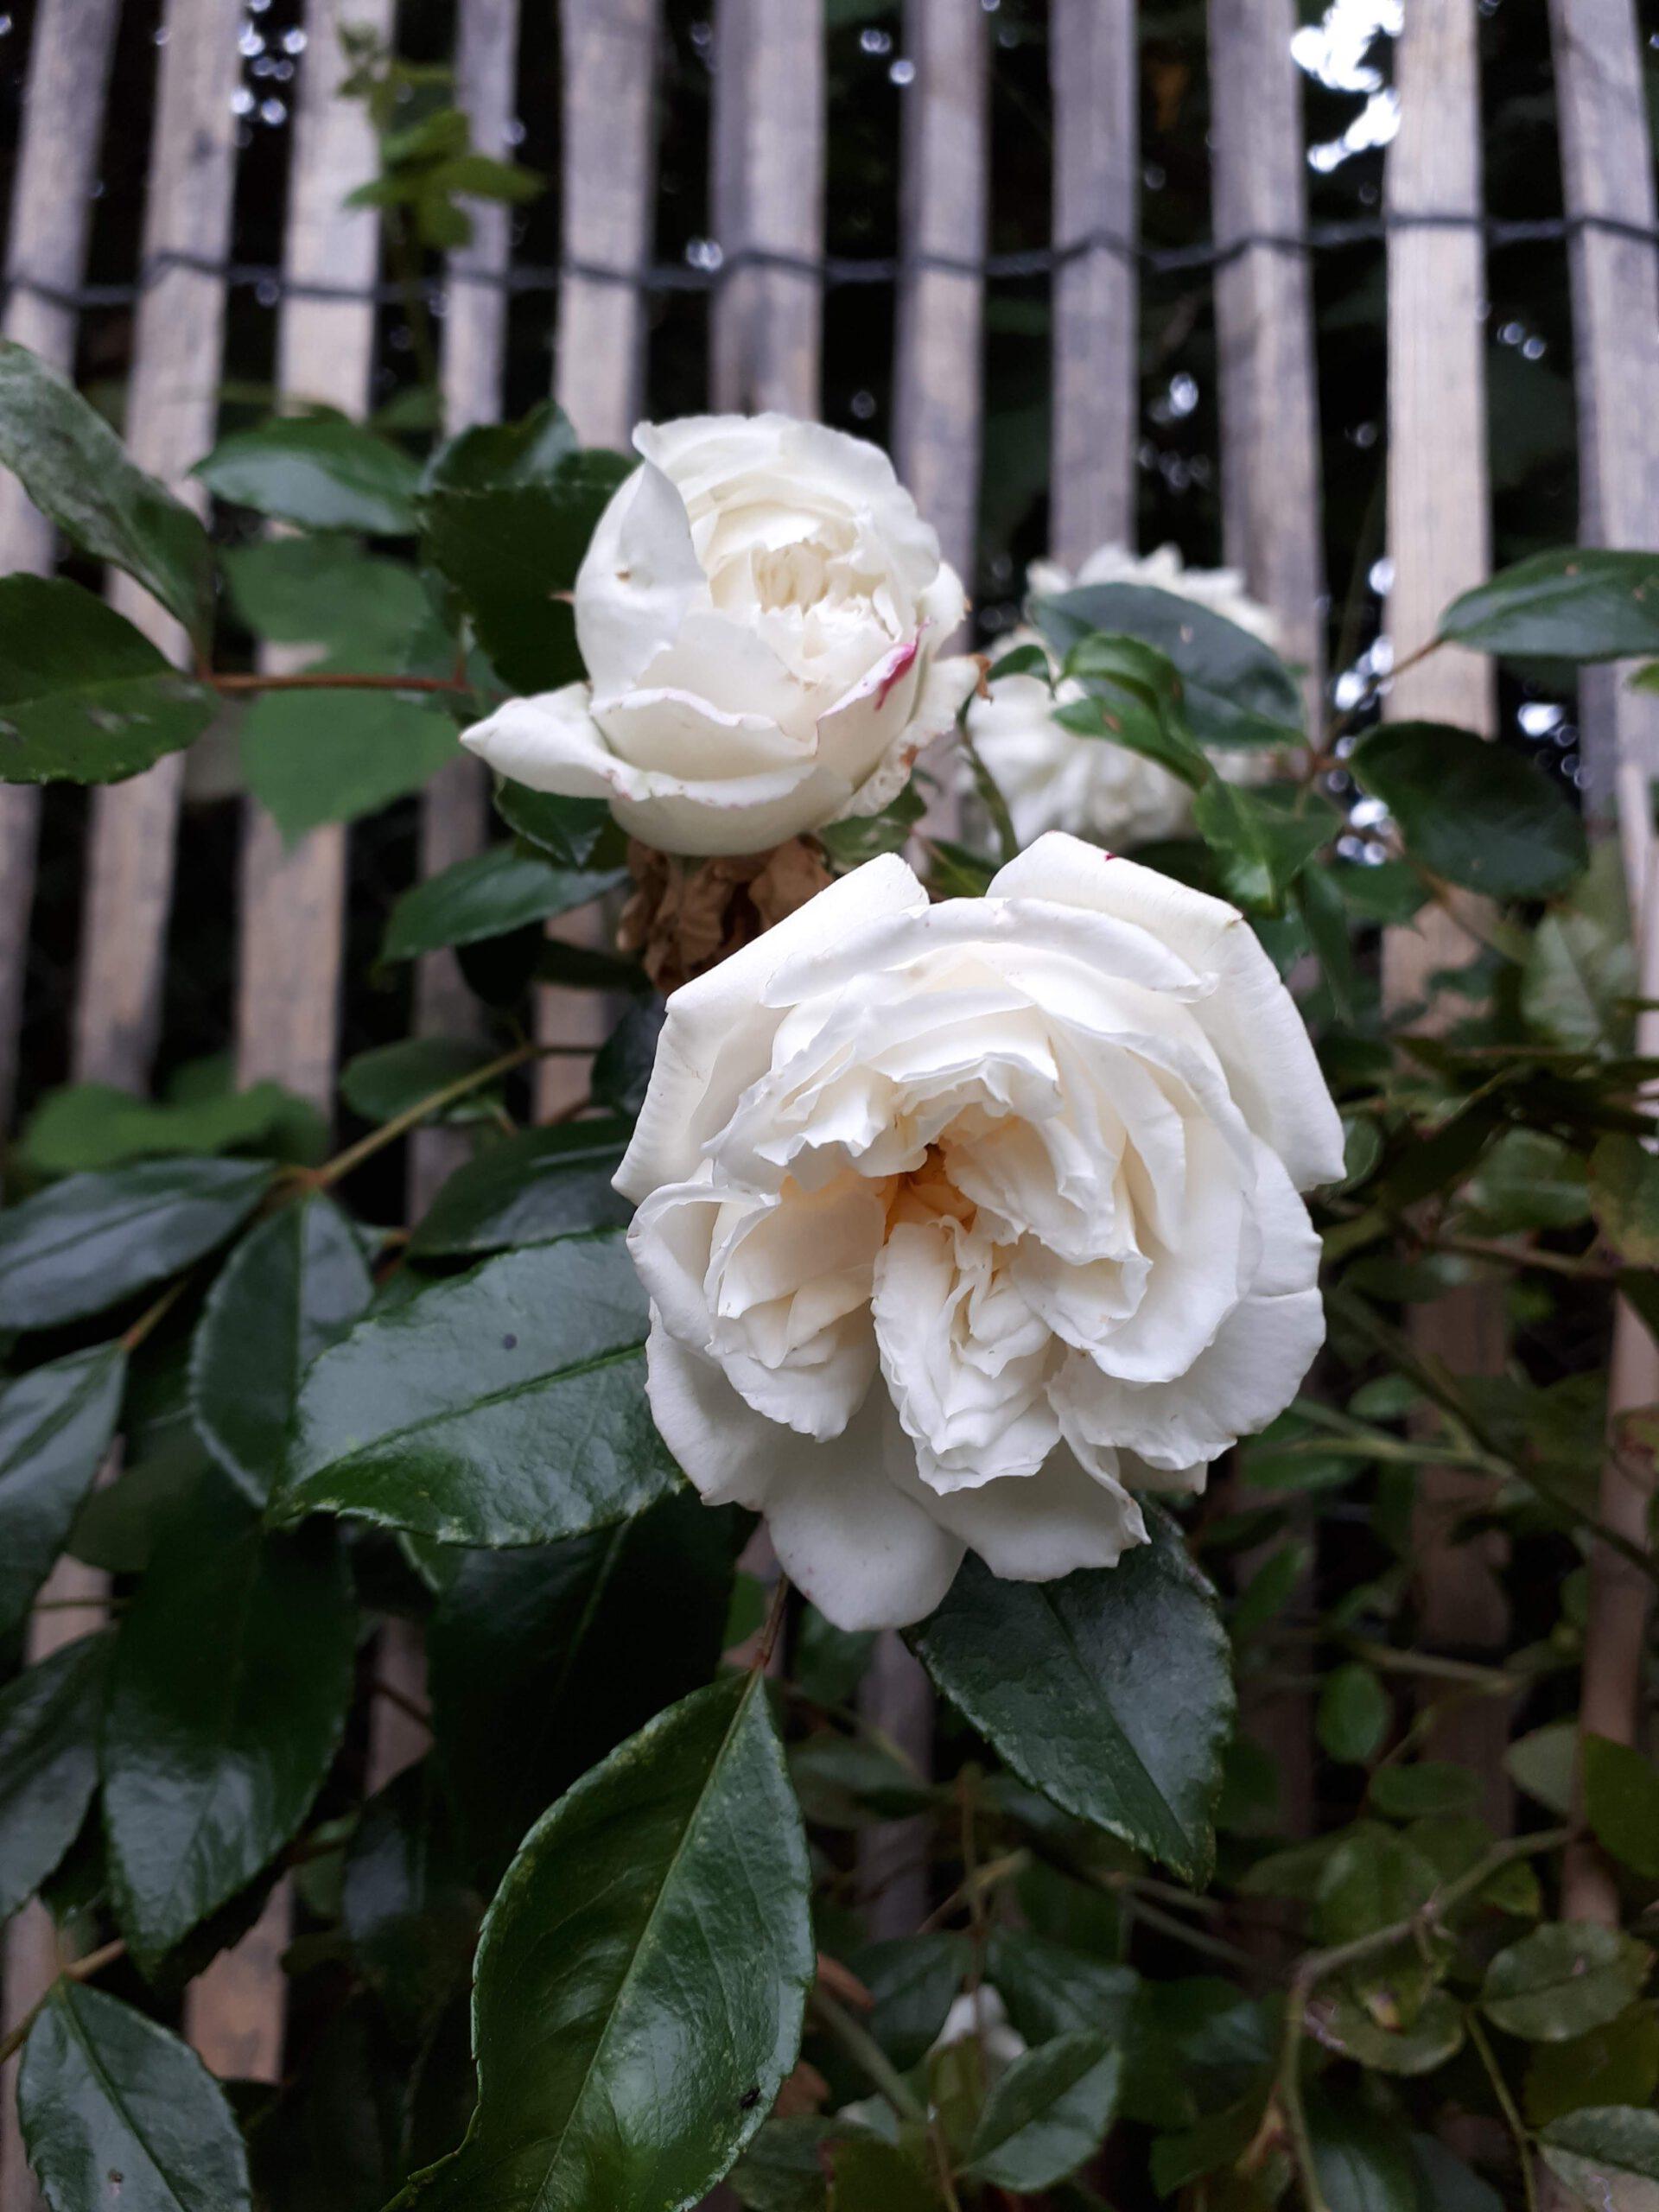 Meine Rosensorten, hier der Rambler Alberic Barbier.